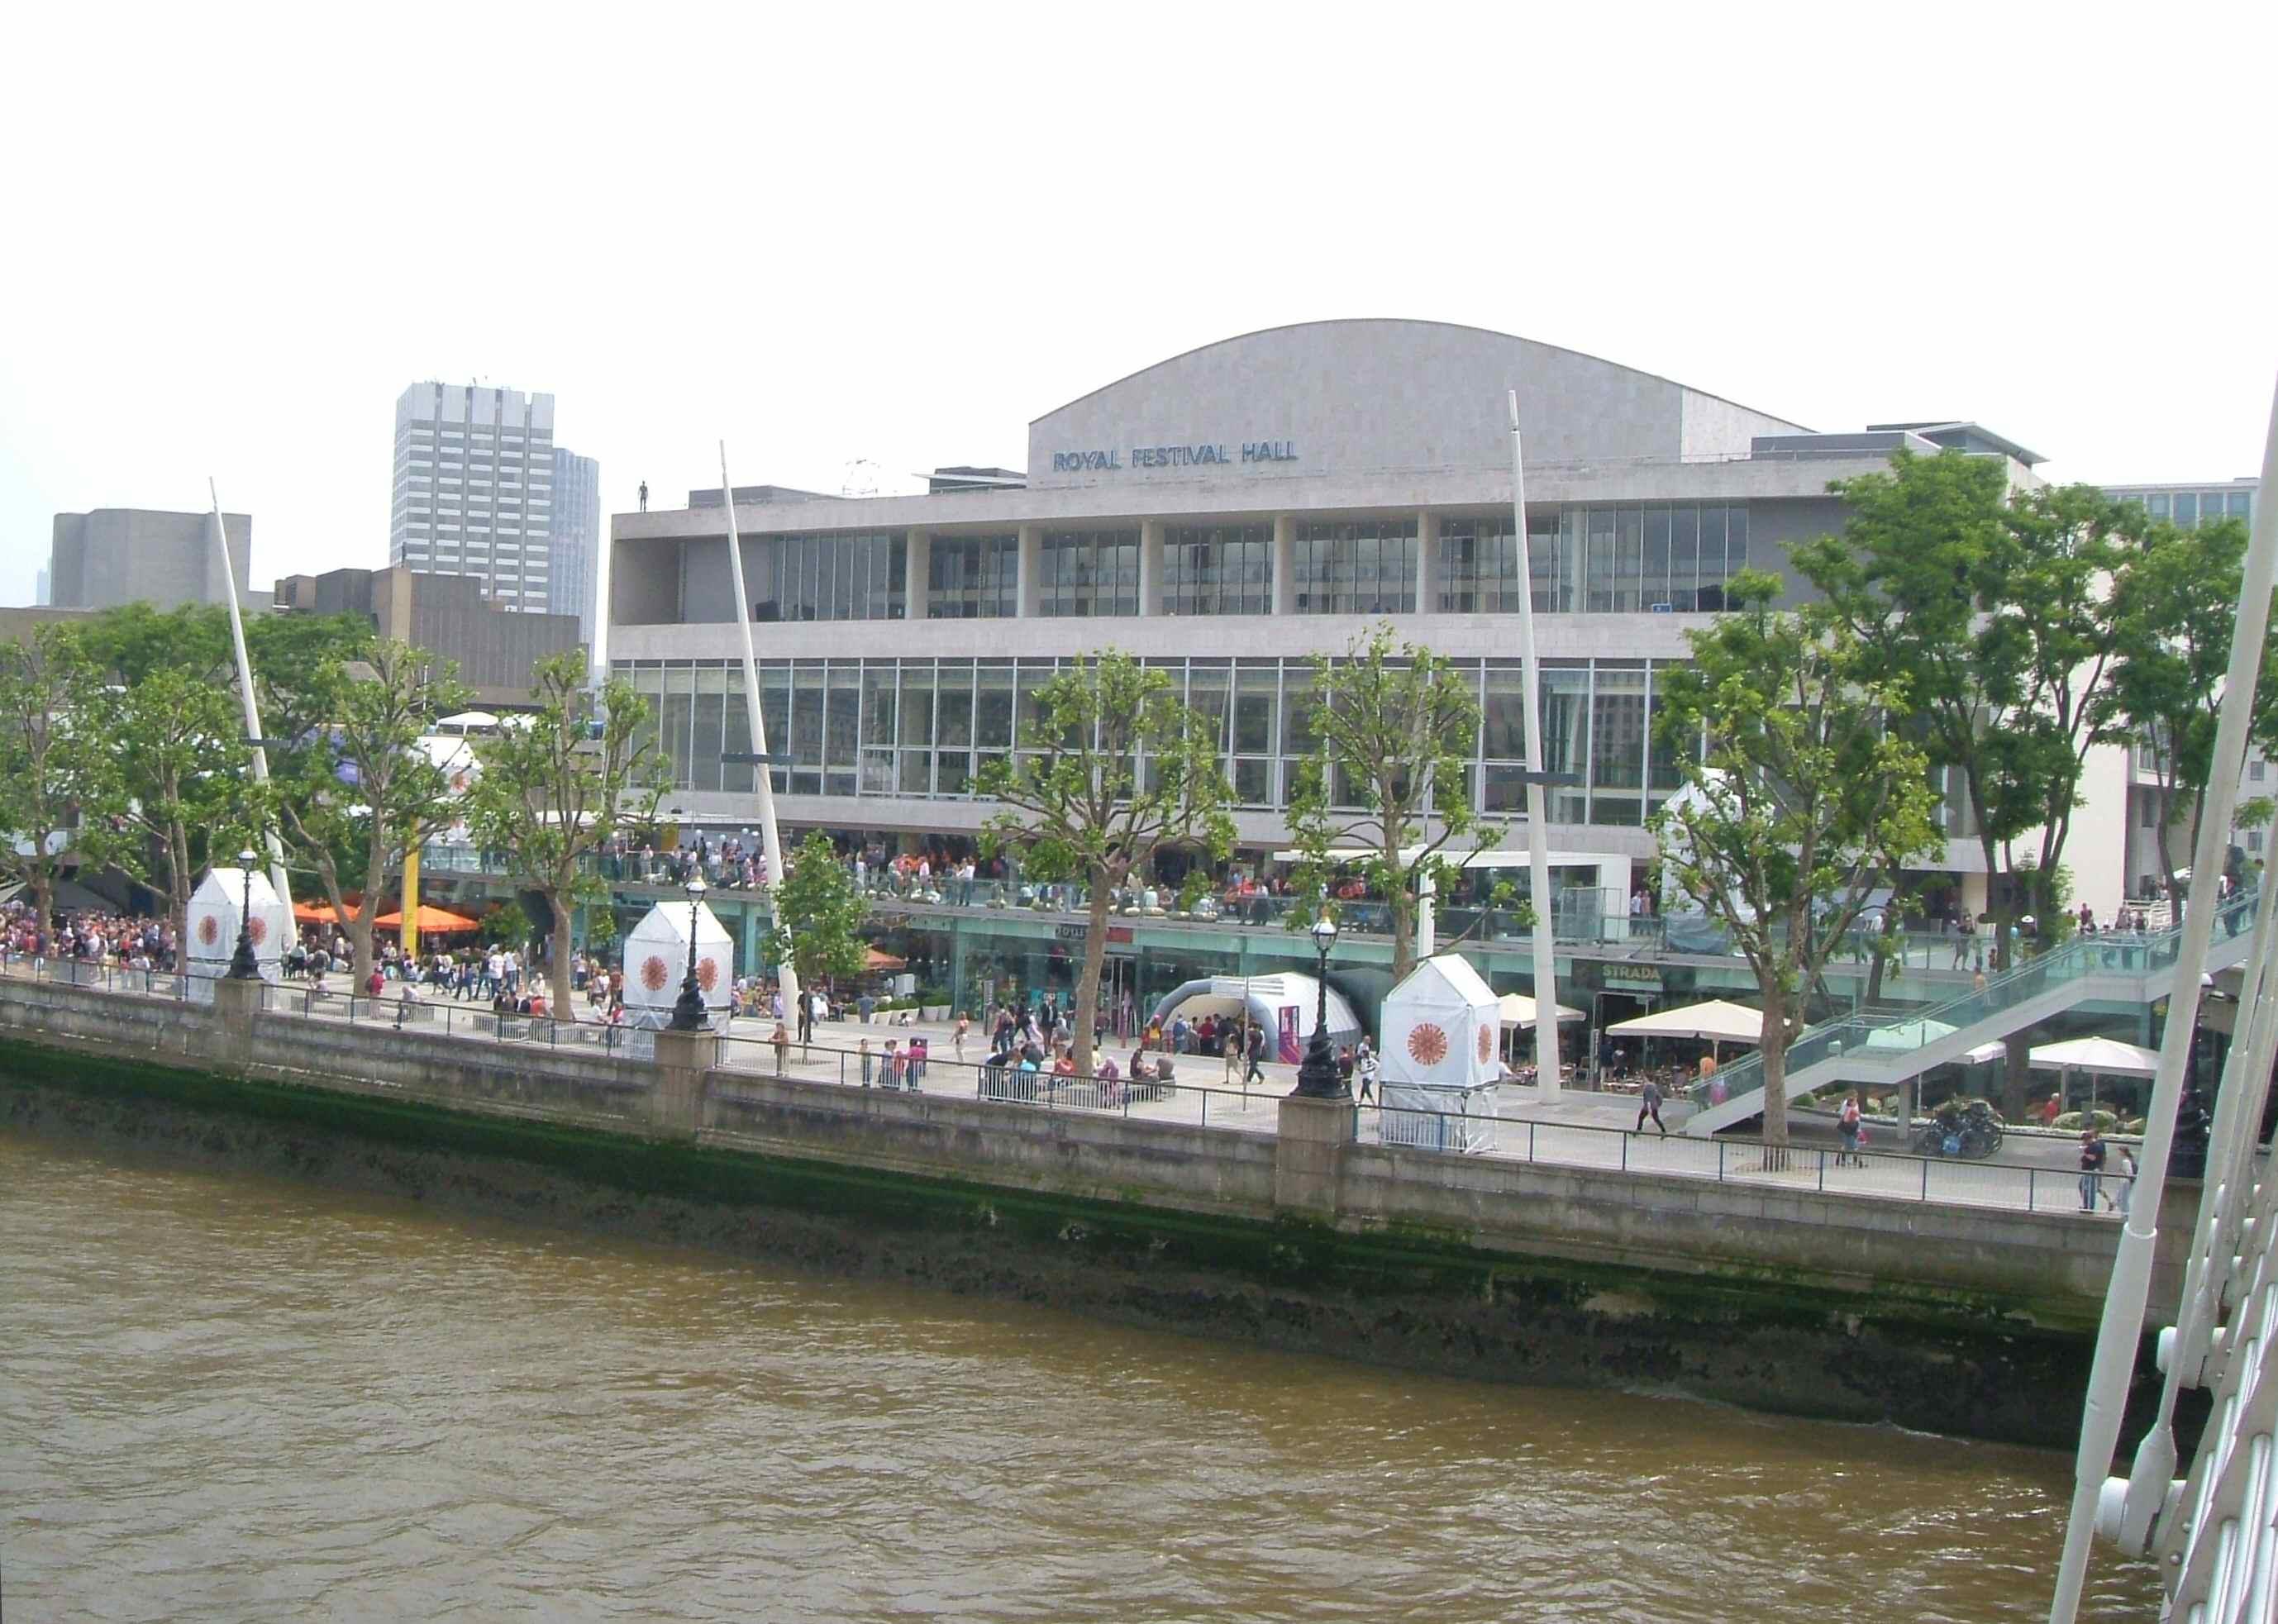 Depiction of Royal Festival Hall